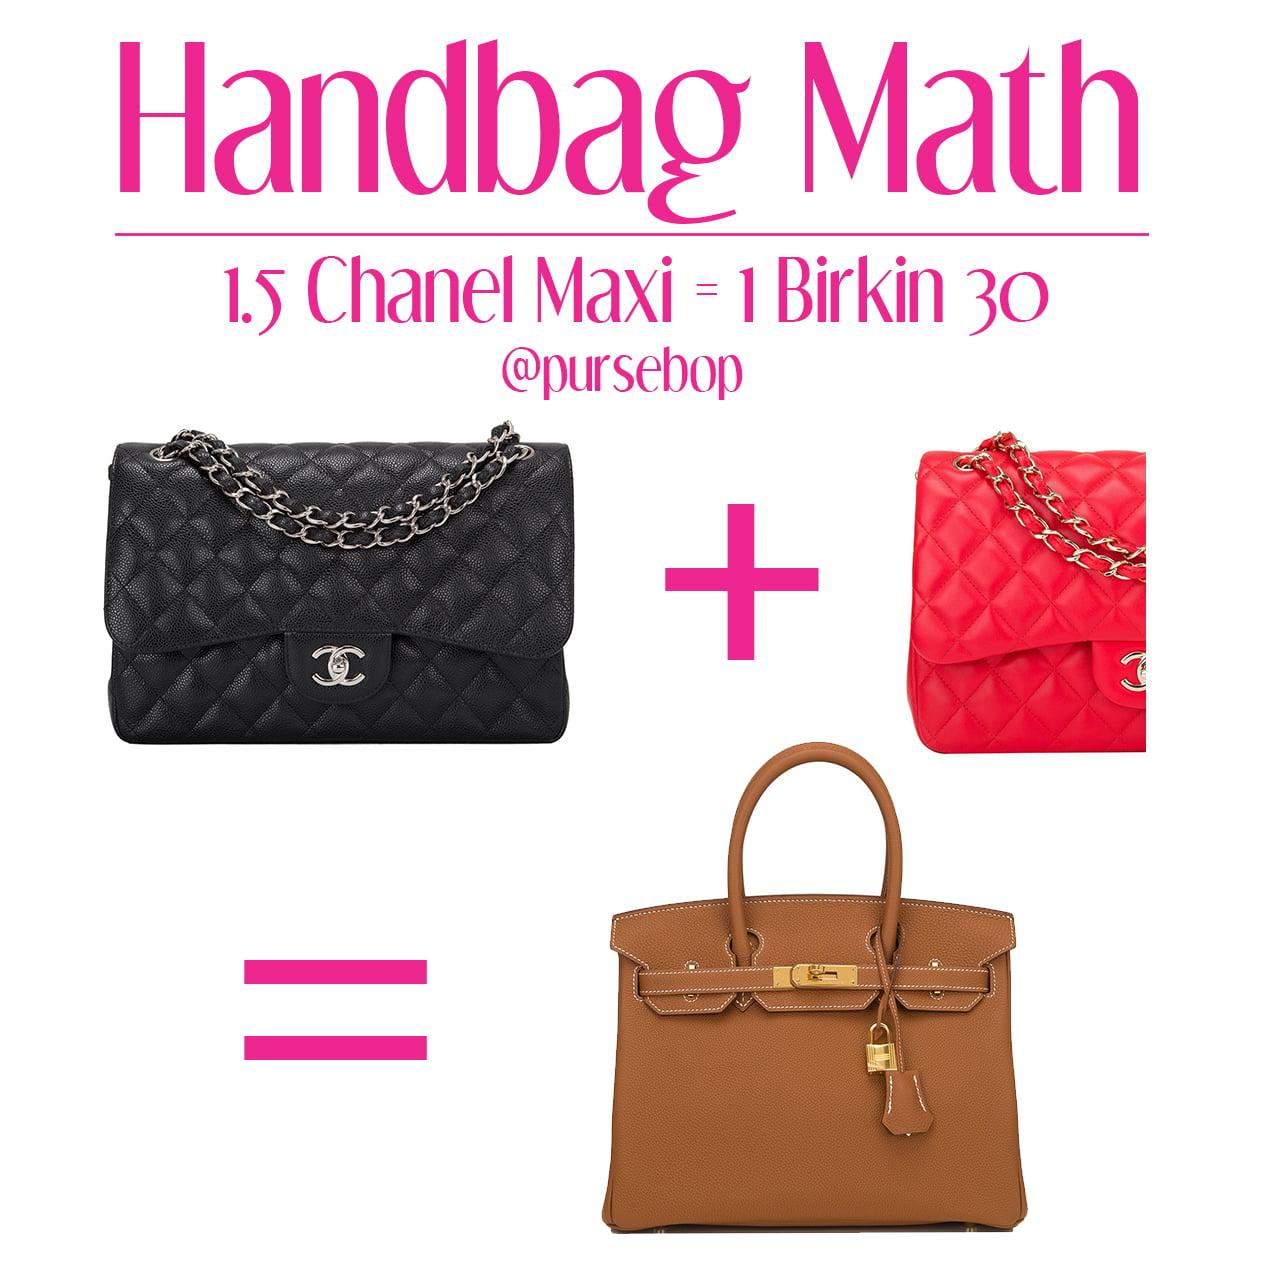 0008 - Chanel-equals-Birkin_vs1